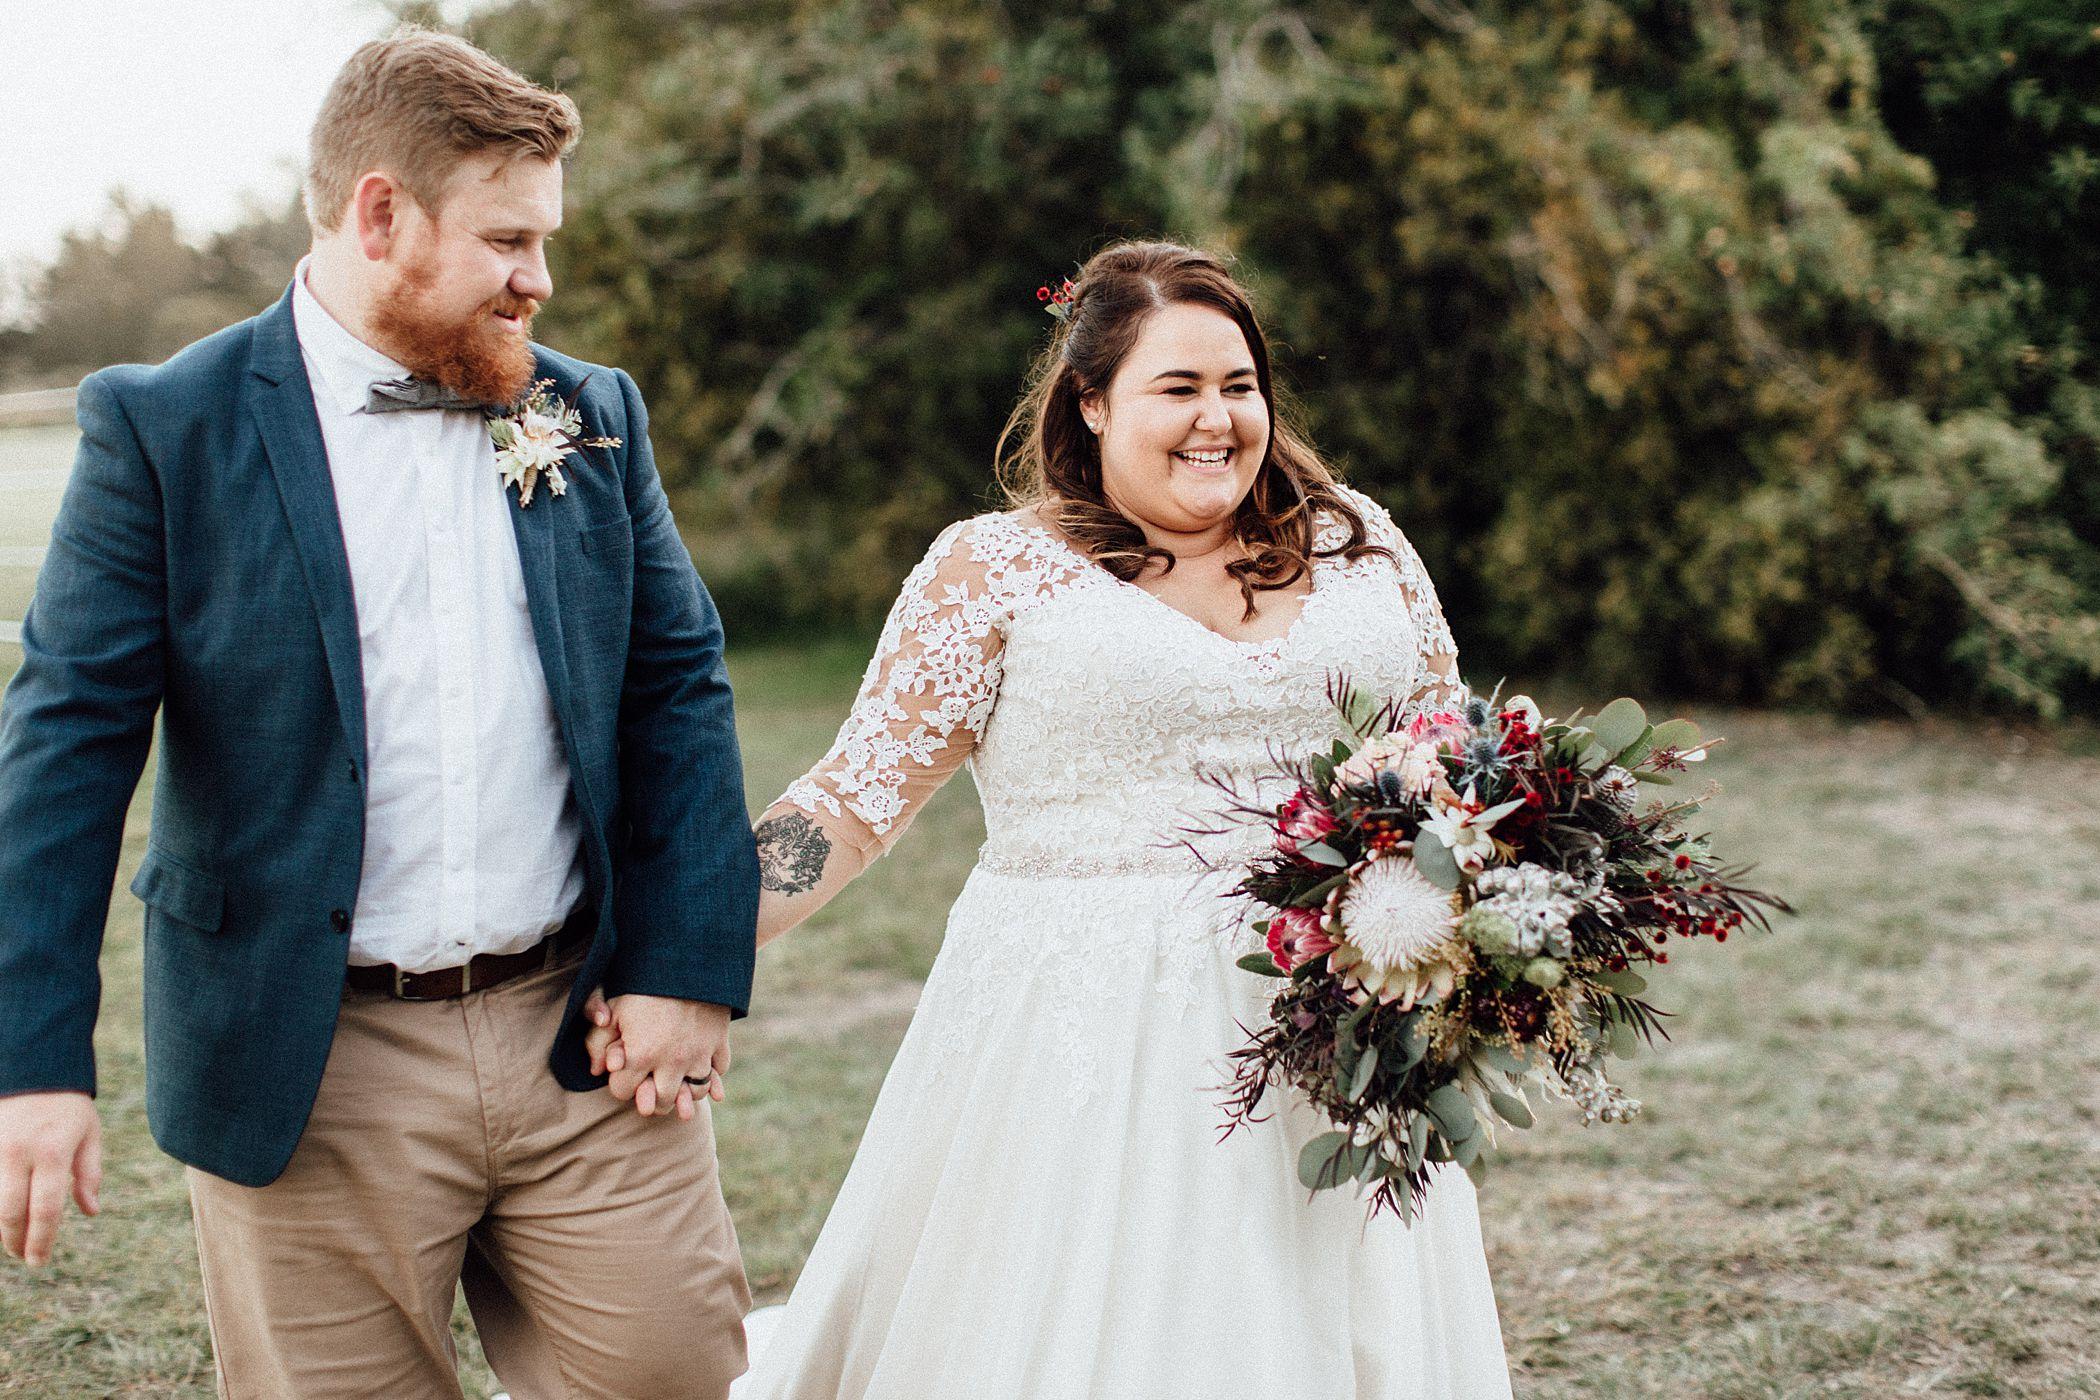 lauren-anne-photography-newcastle-hunter-valley-wedding-photographer_1234.jpg